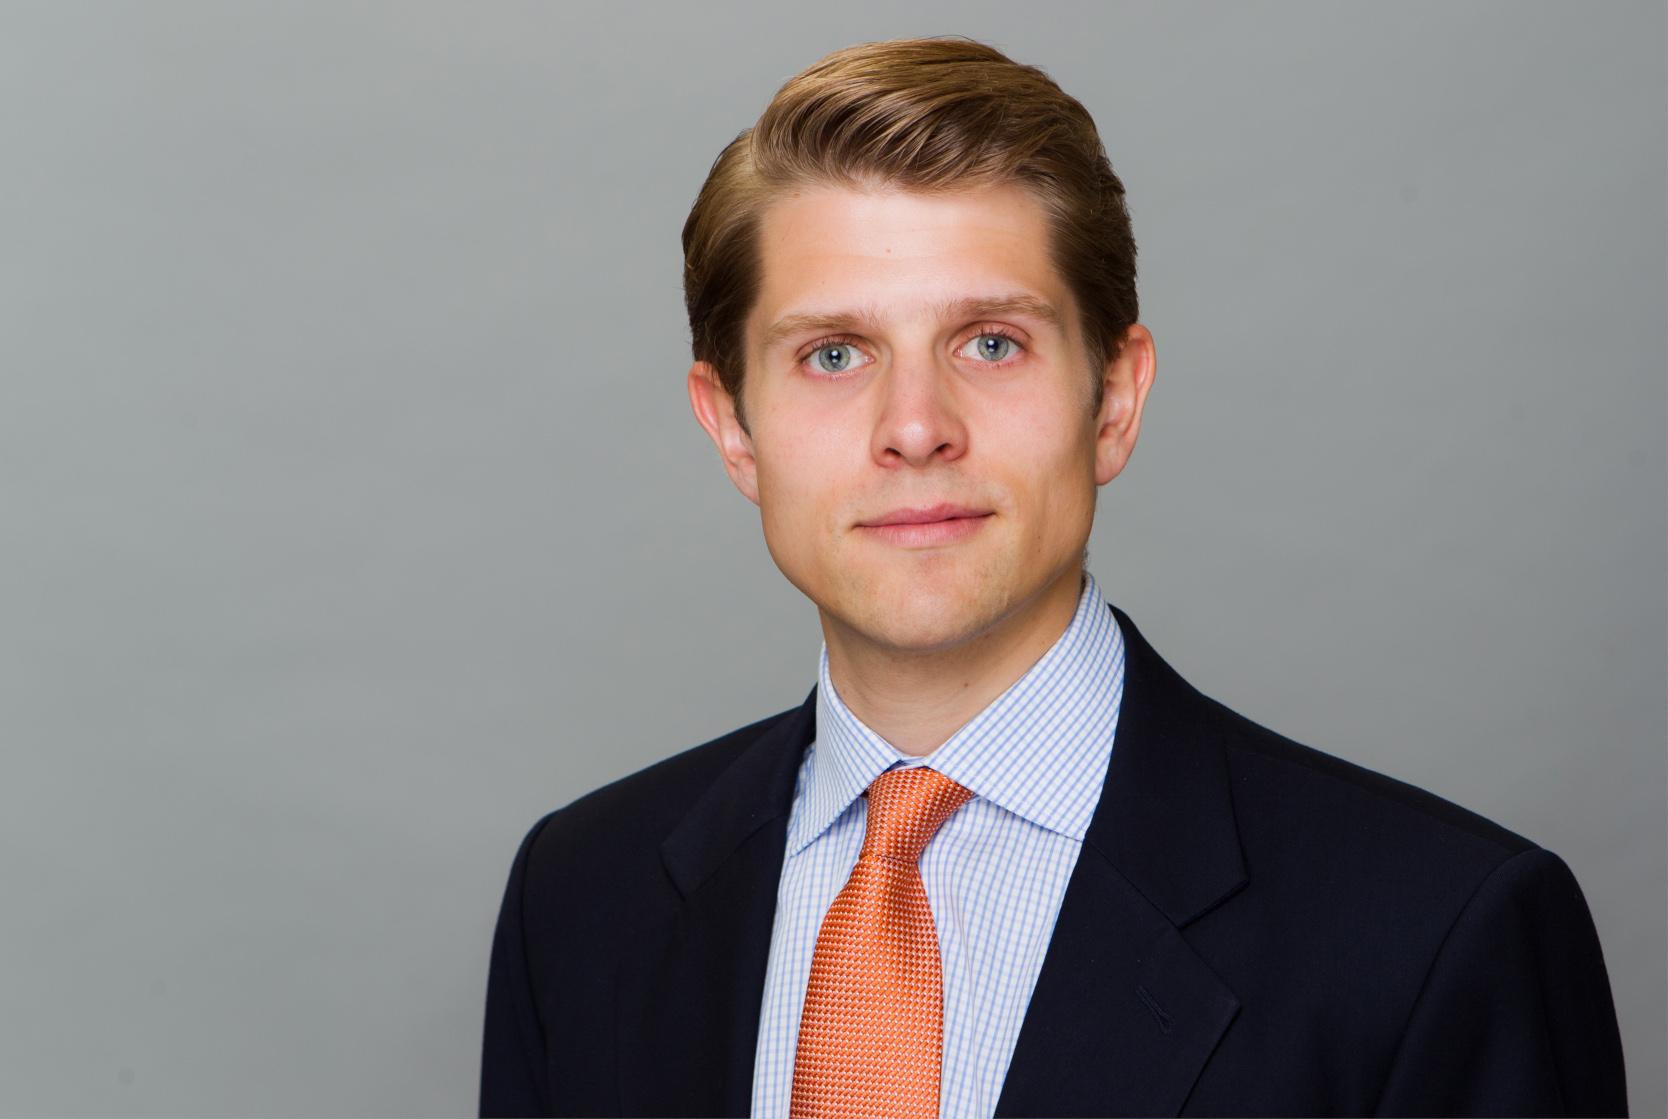 Dr. Christoph Rose